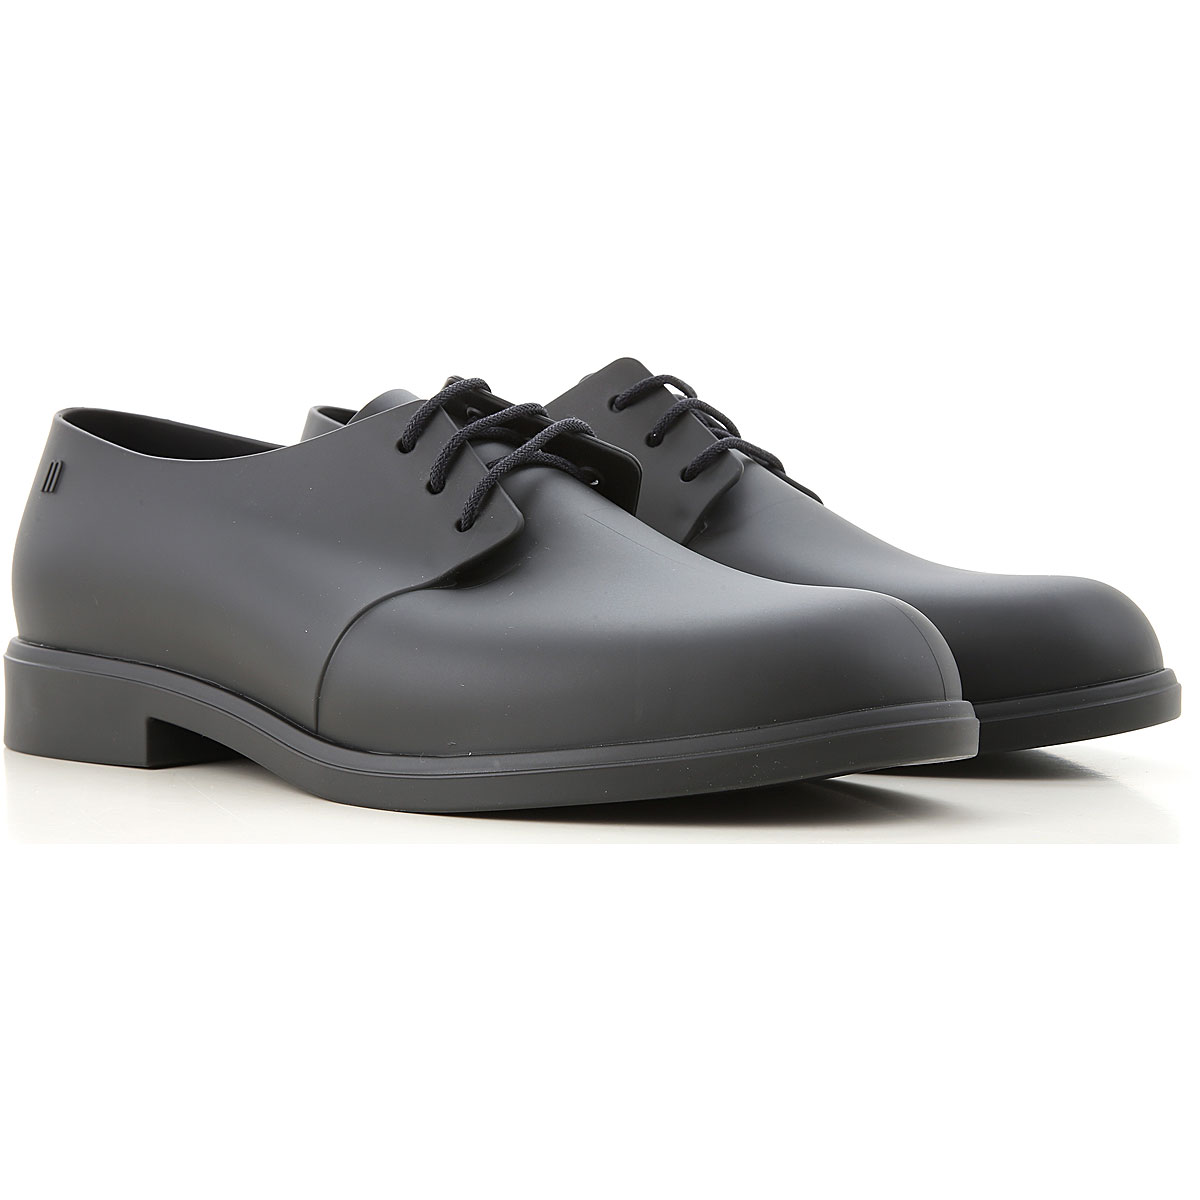 Melissa Lace Up Shoes for Men Oxfords, Derbies and Brogues On Sale, Black, PVC, 2019, 10 11.5 9